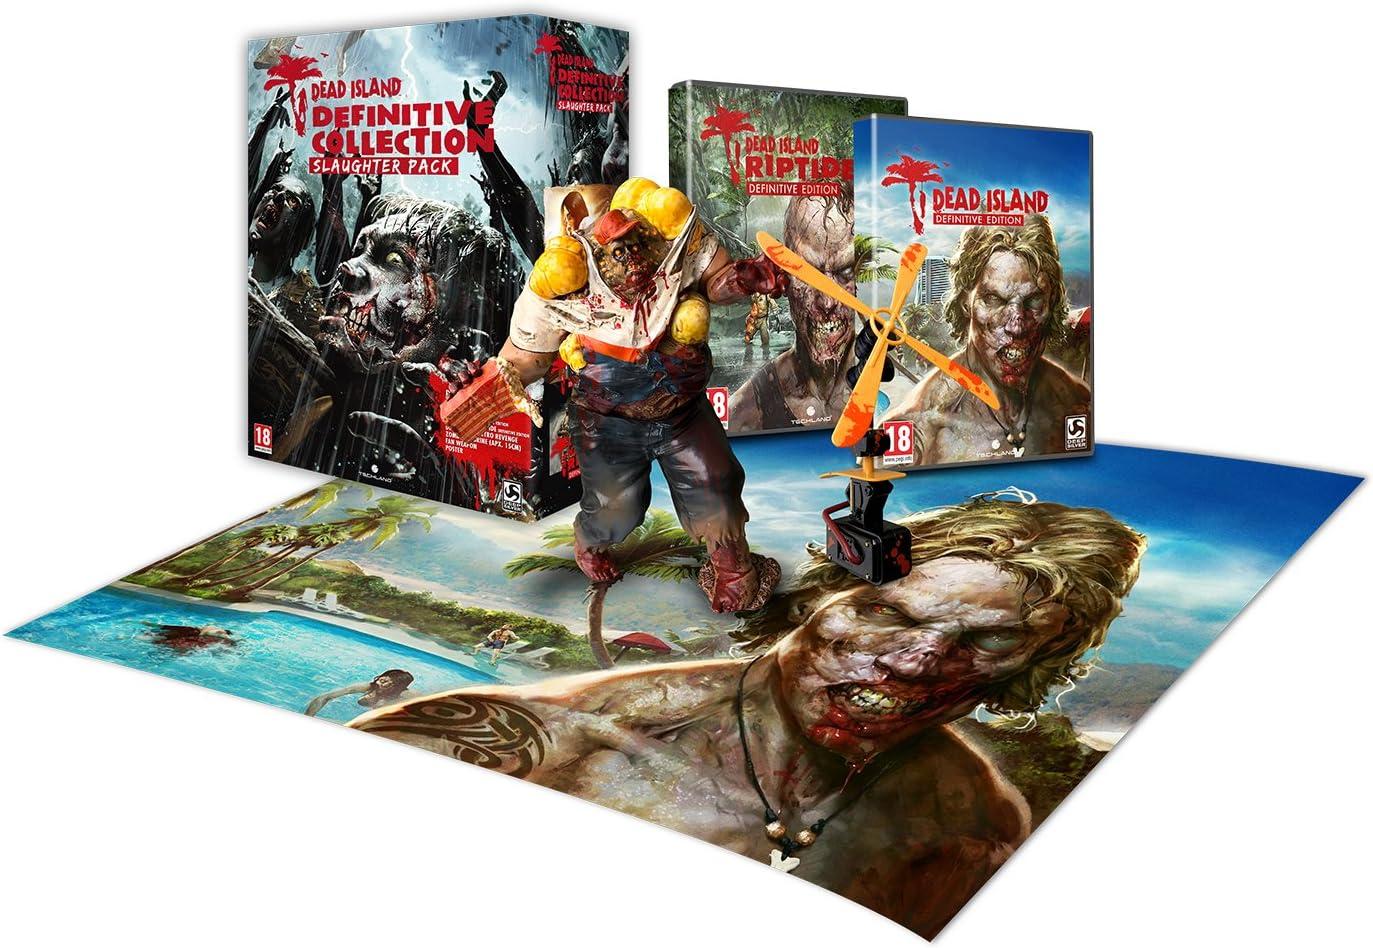 Dead Island: Definitive Collection - Slaughter Pack: Amazon.es: Videojuegos